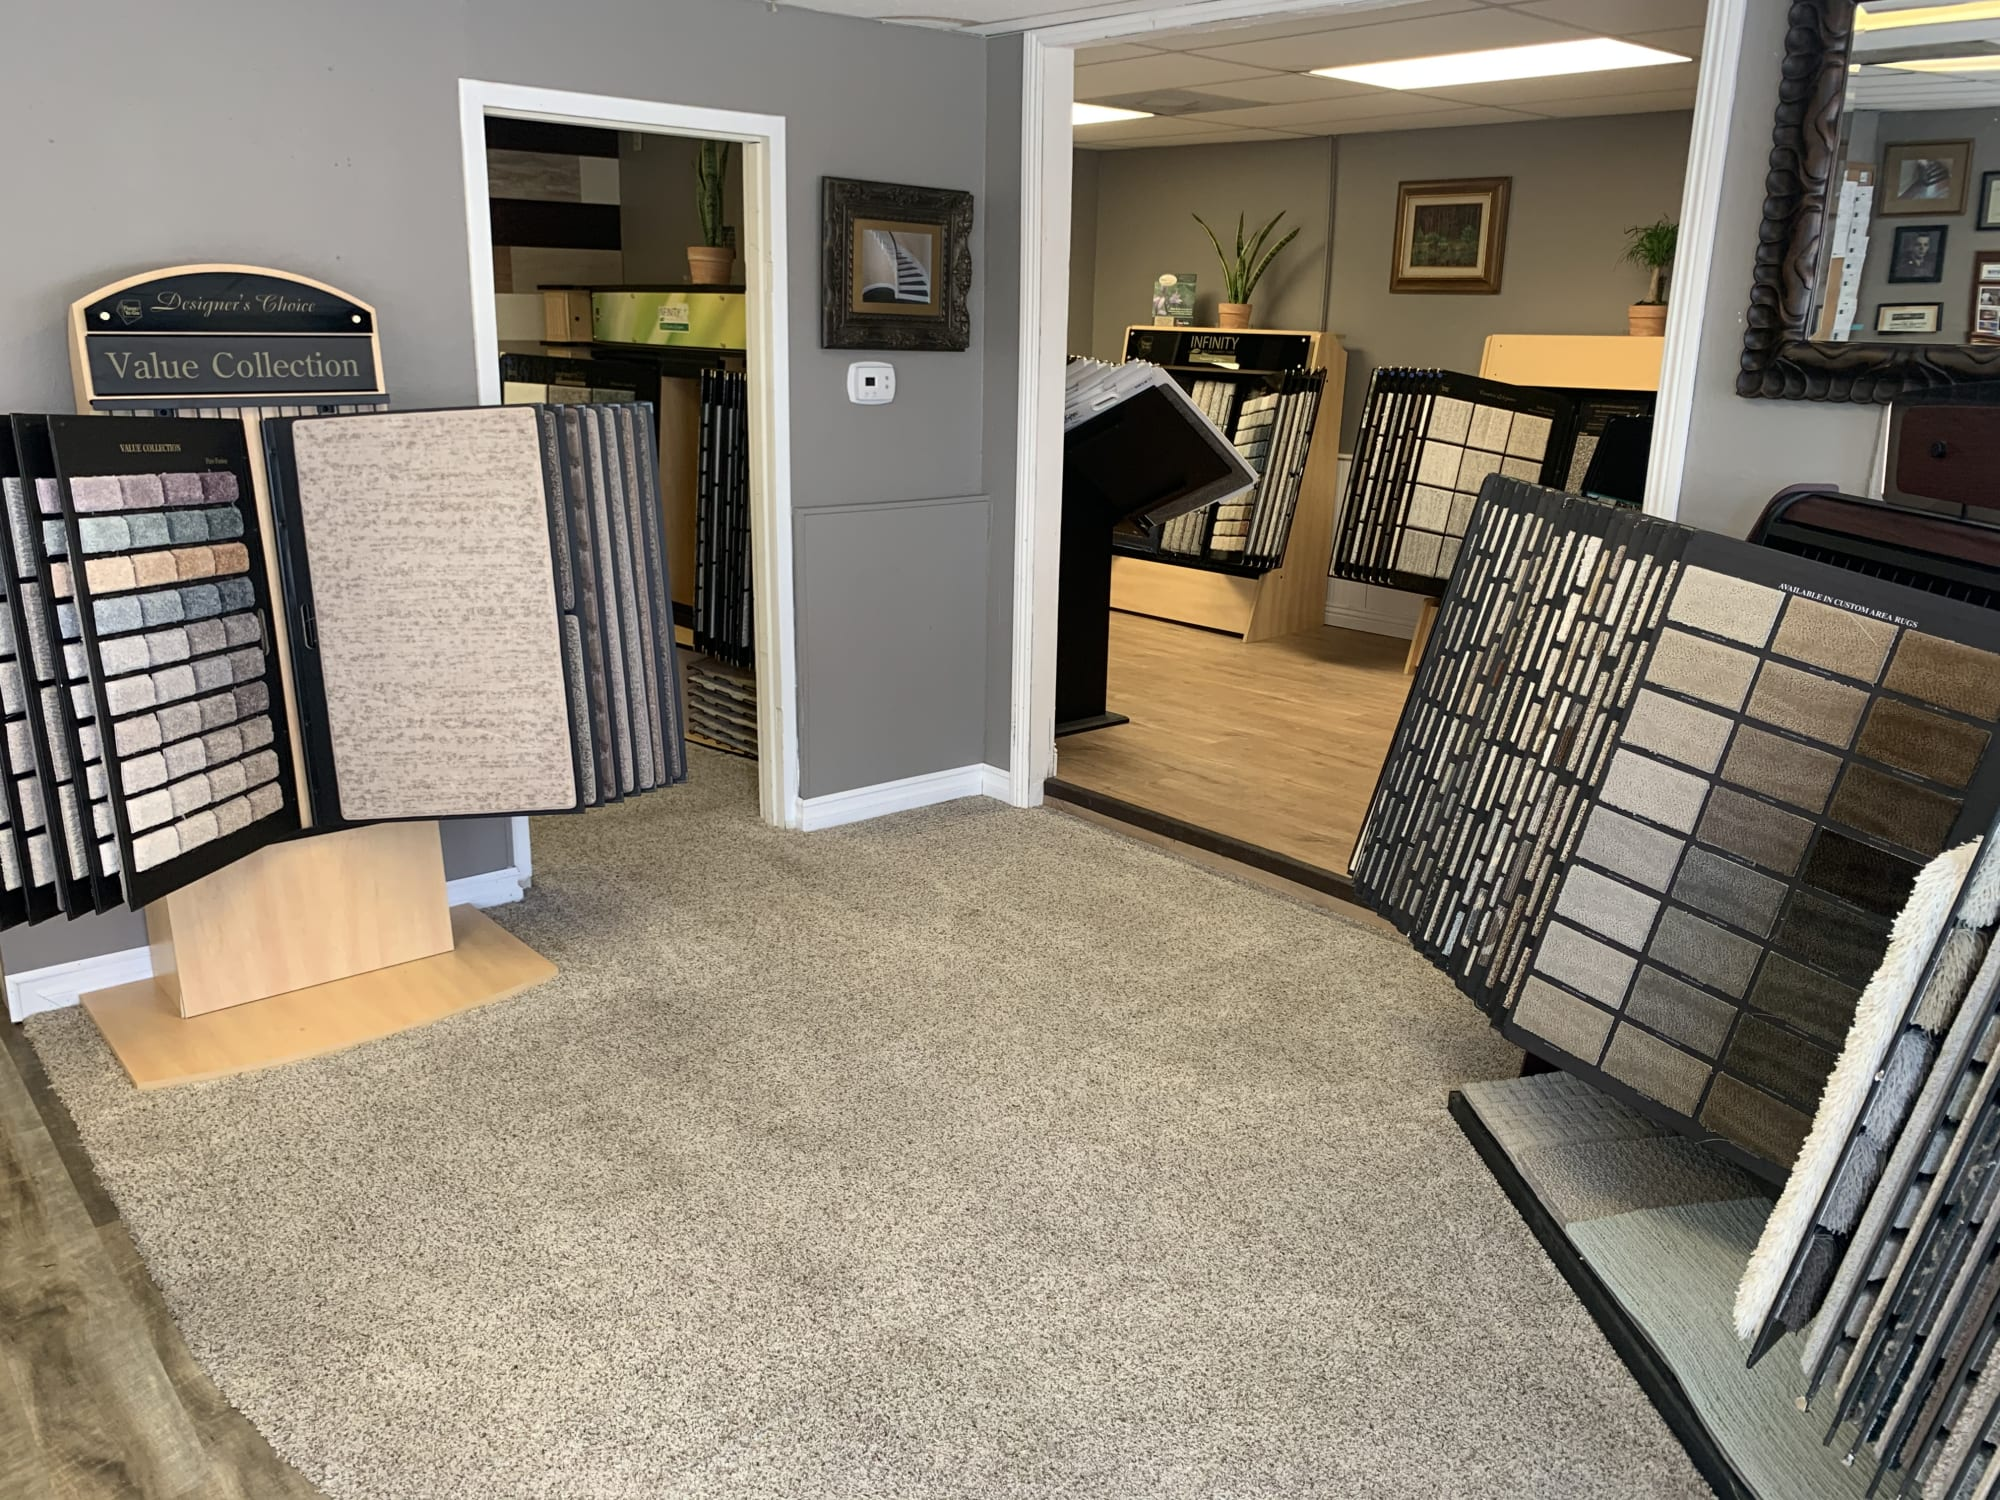 Wally's Carpet & Tile - 33328 Calimesa Blvd Yucaipa, CA 92399